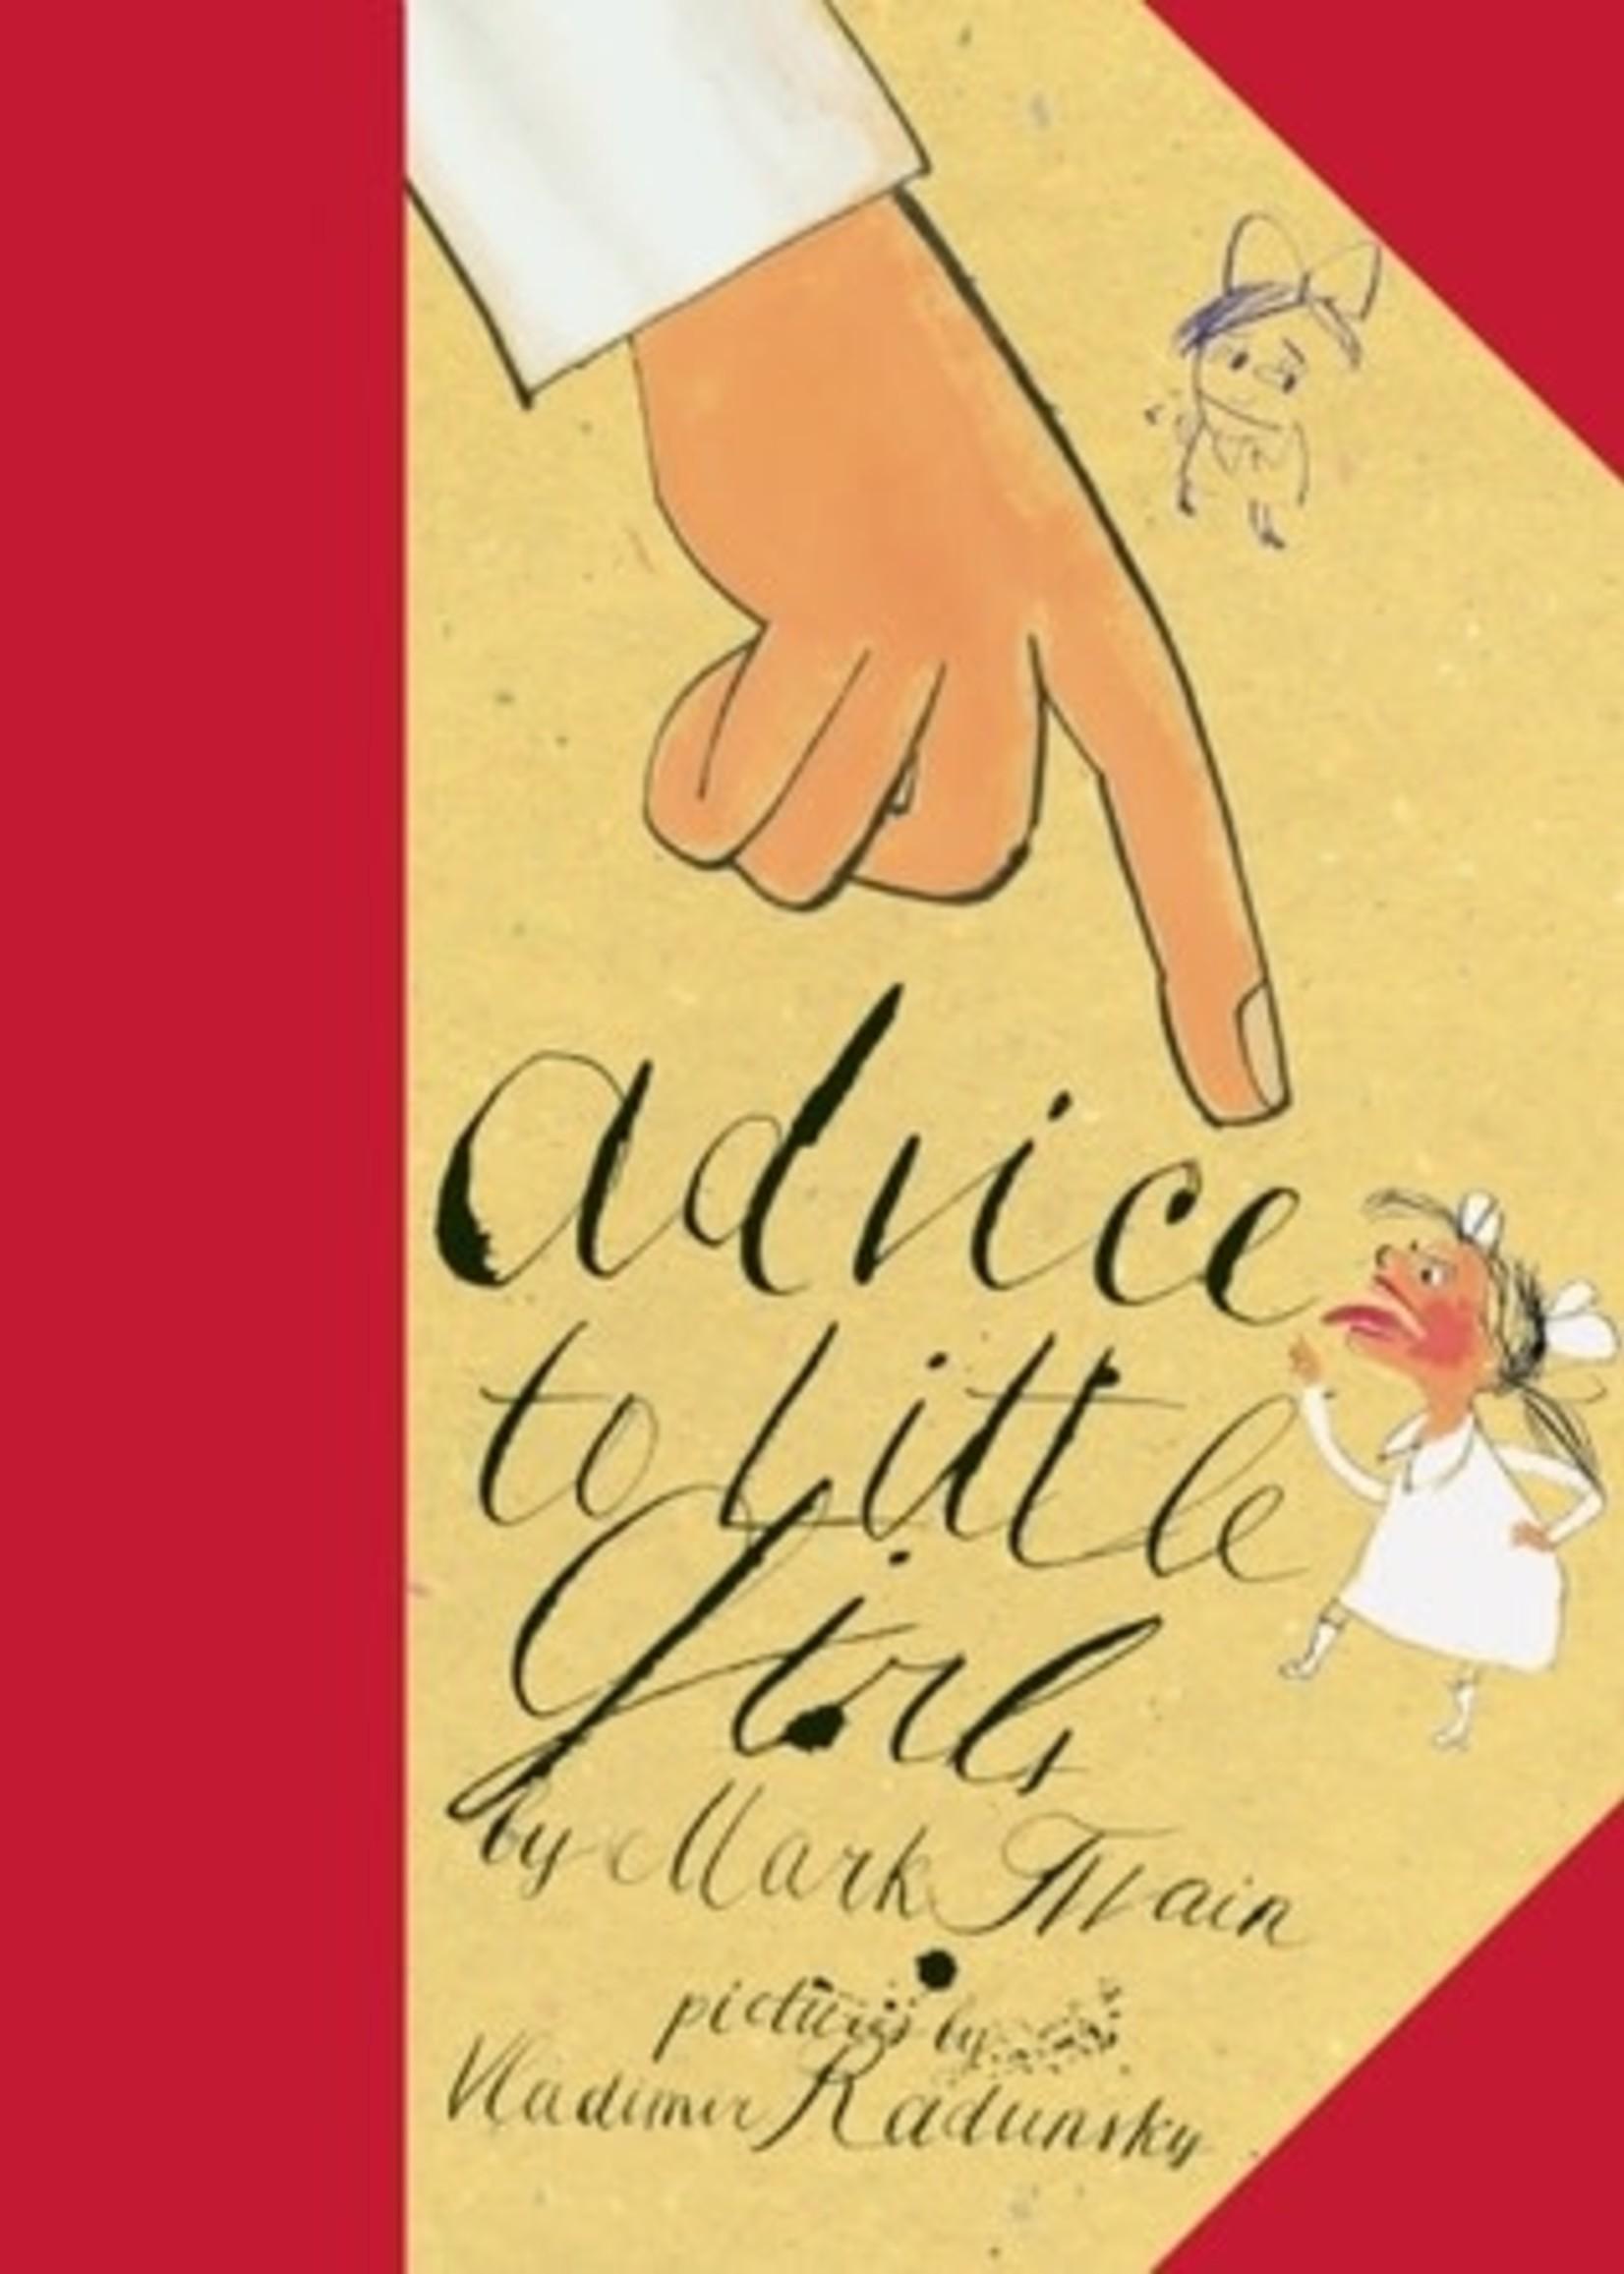 Advice to Little Girls by Mark Twain, Vladimir Radunsky